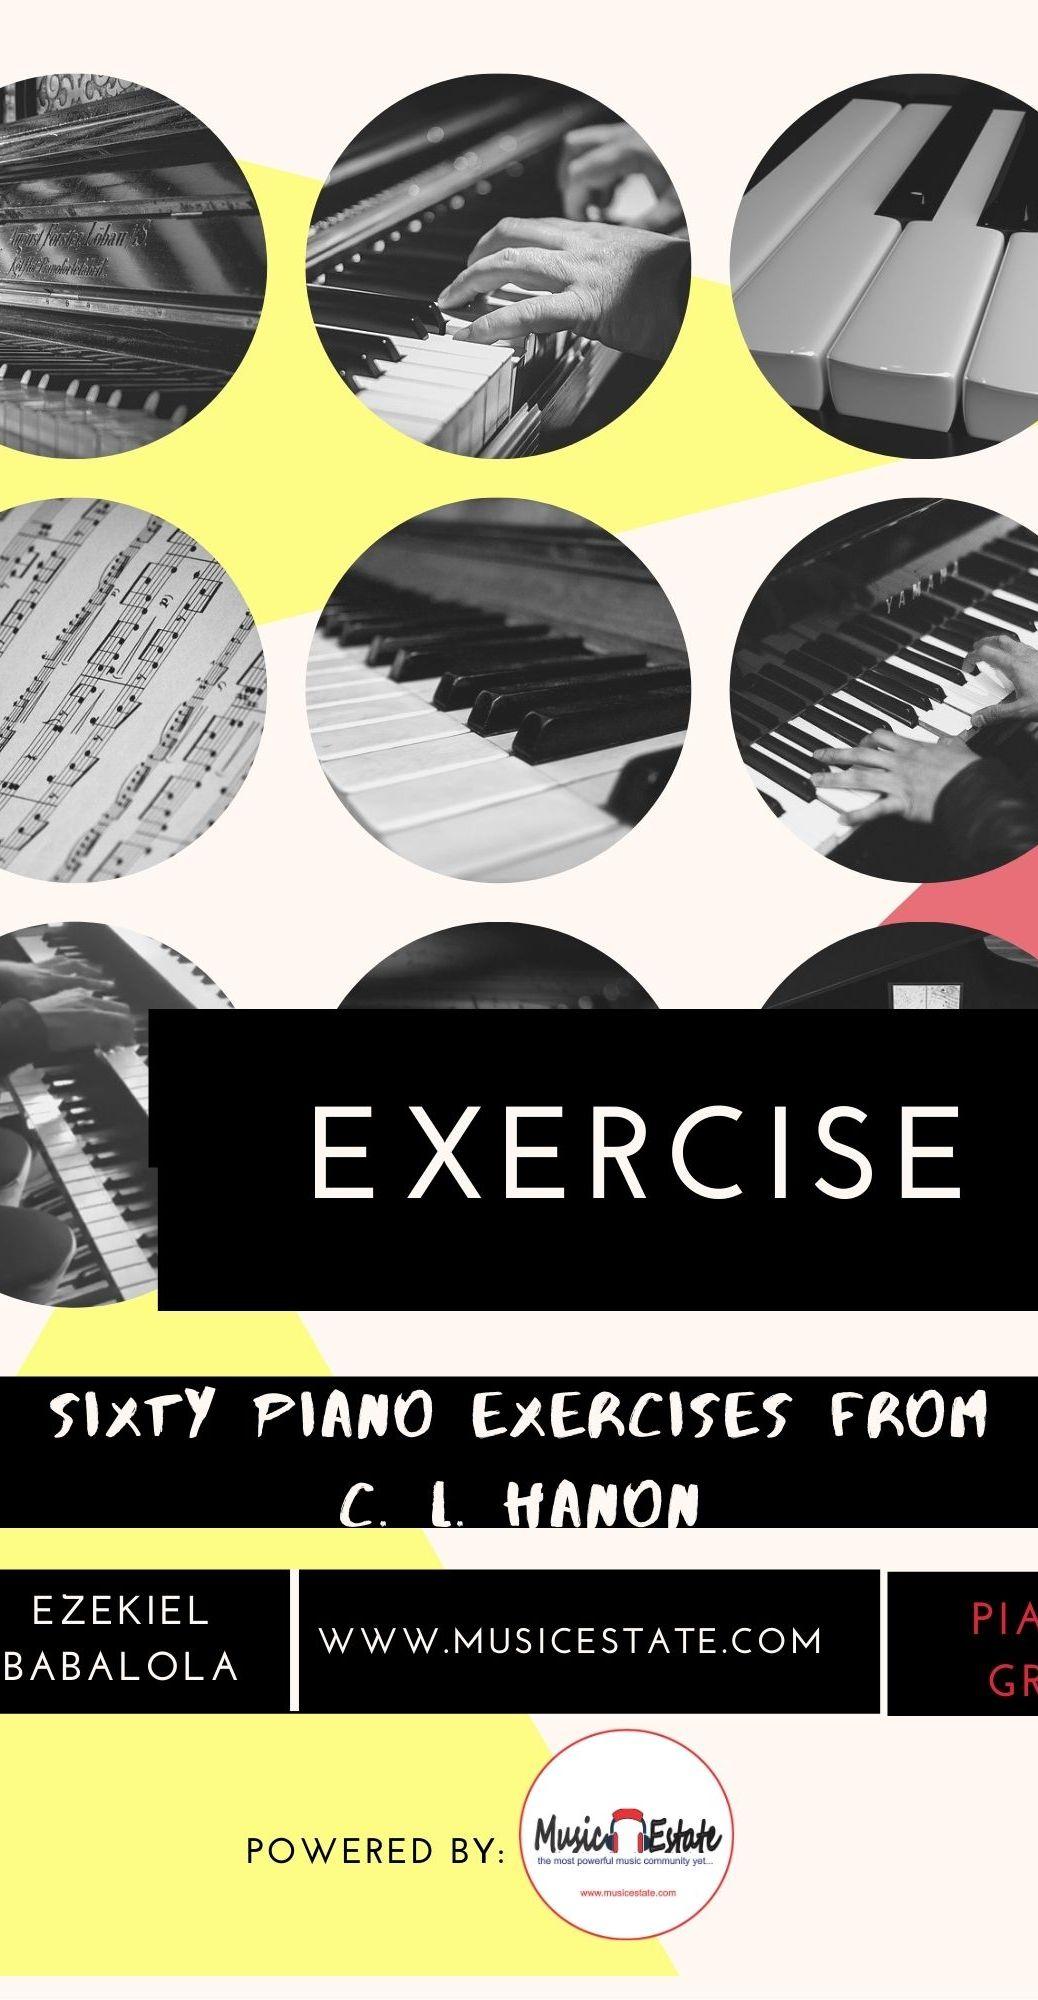 C. L. Hanon Piano exercise 5